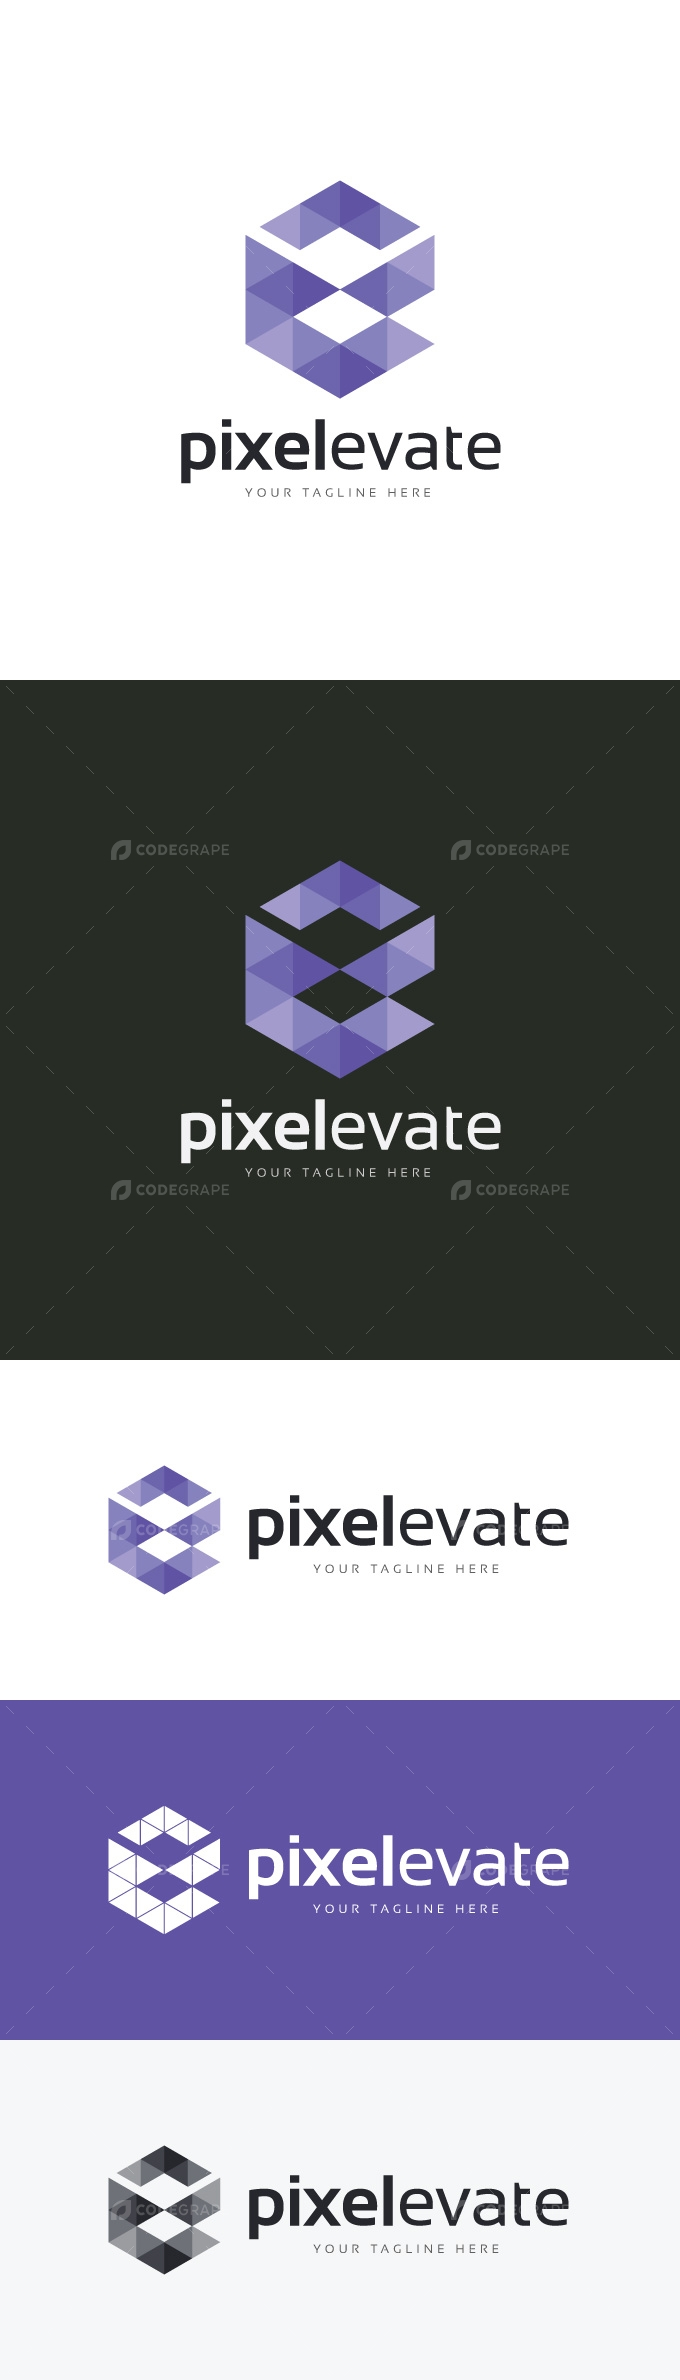 Pixel Elevate Logo